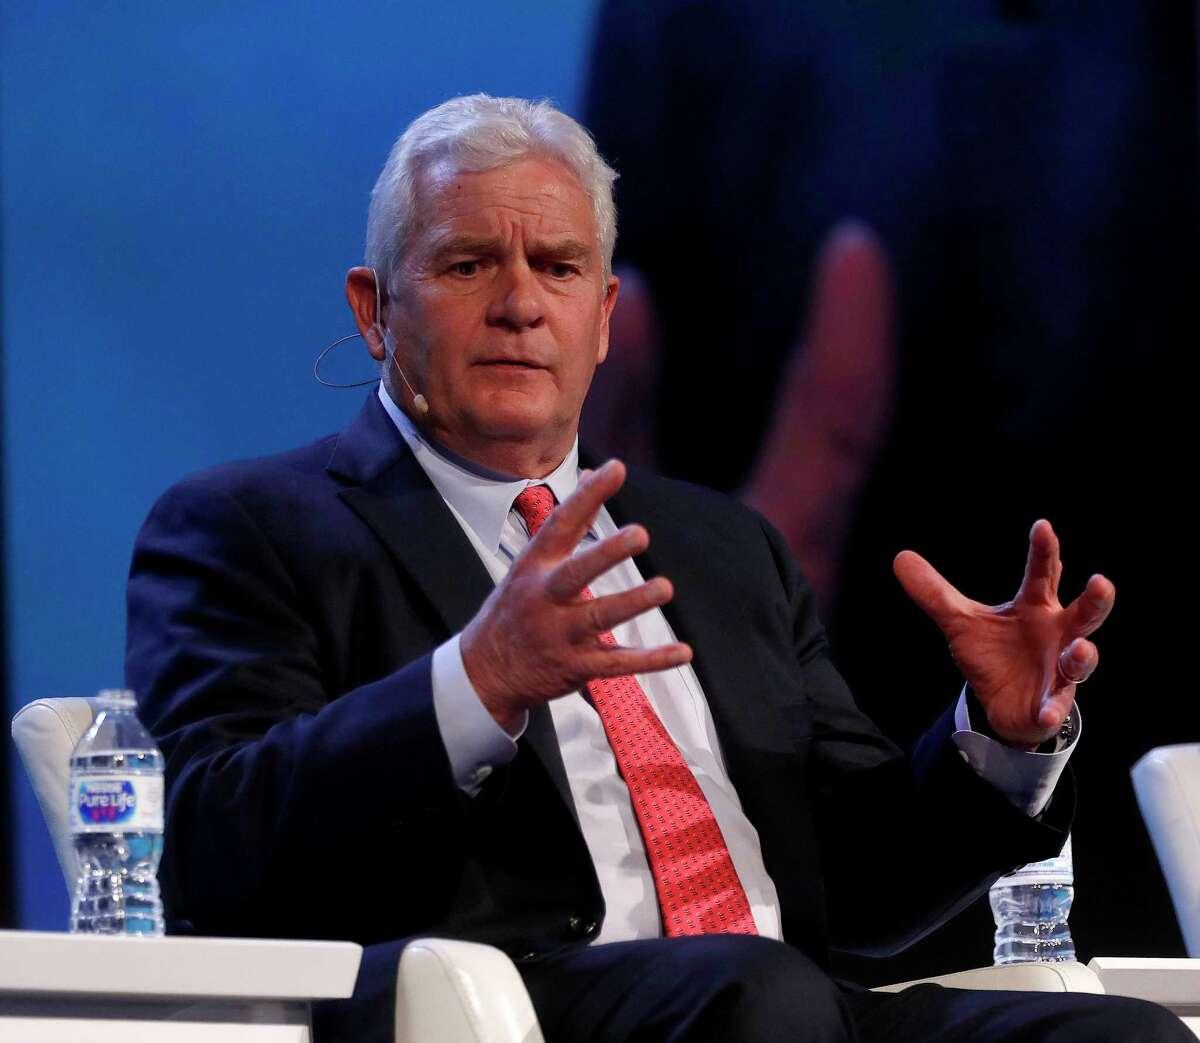 Kelcy Warren, co-founder of Energy Transfer Partners, donated $1 million to Gov. Greg Abbott after Winter Storm Uri.